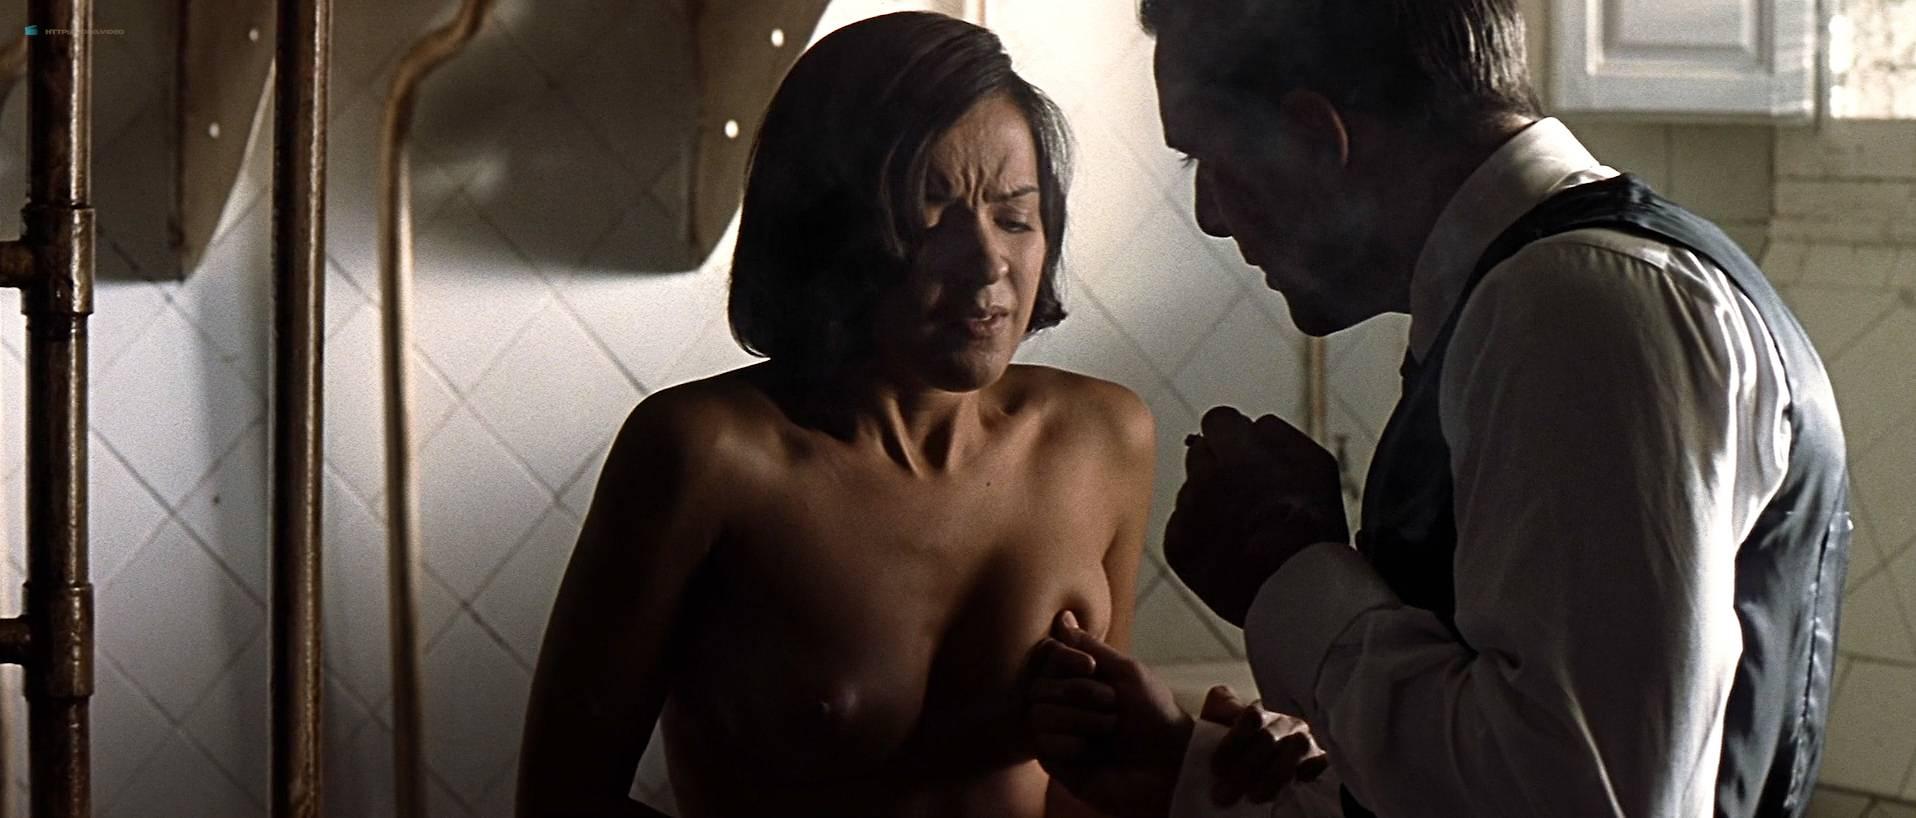 Verónica Sánchez nude topless and butt - Las 13 rosas (ES-2007) HD 1080p BluRay (5)